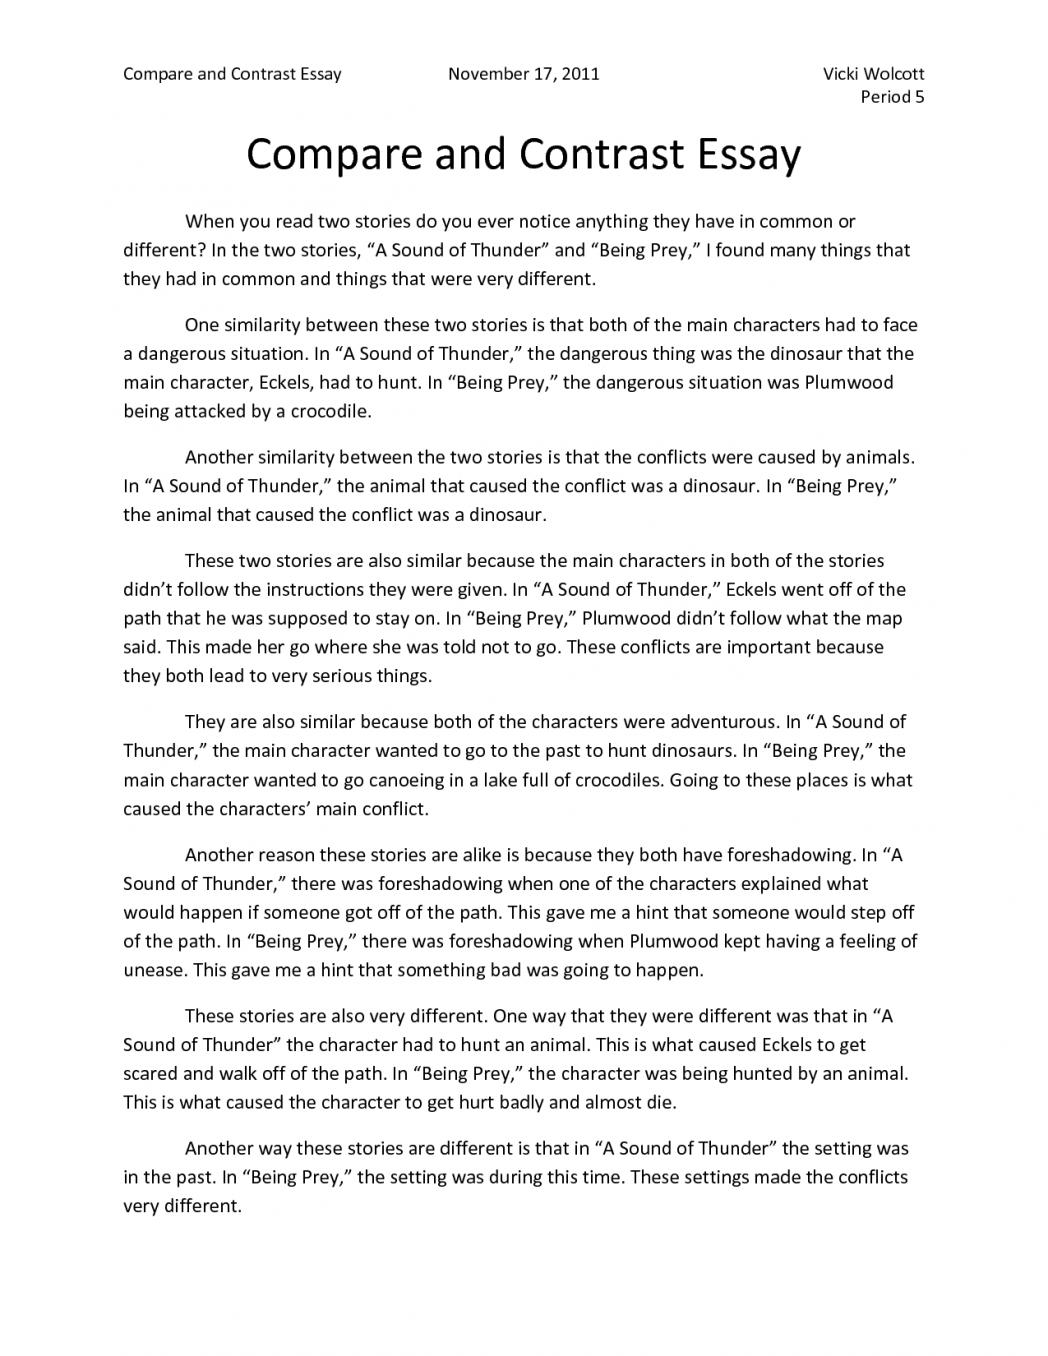 argumentative essay topic ideas causal topics compare and